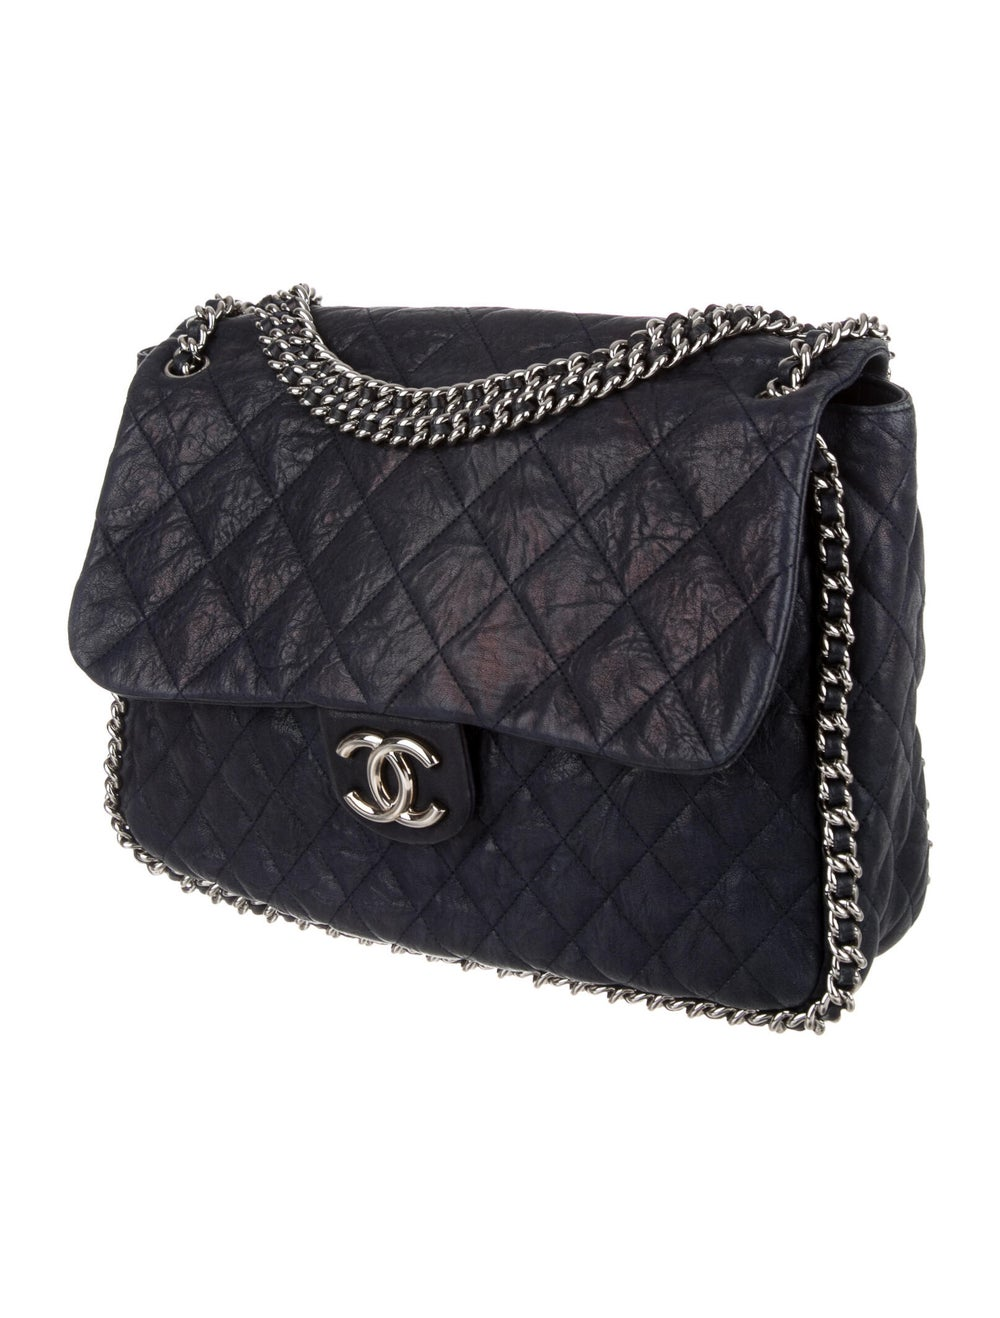 Chanel Maxi Chain-Around Flap Bag Blue - image 3